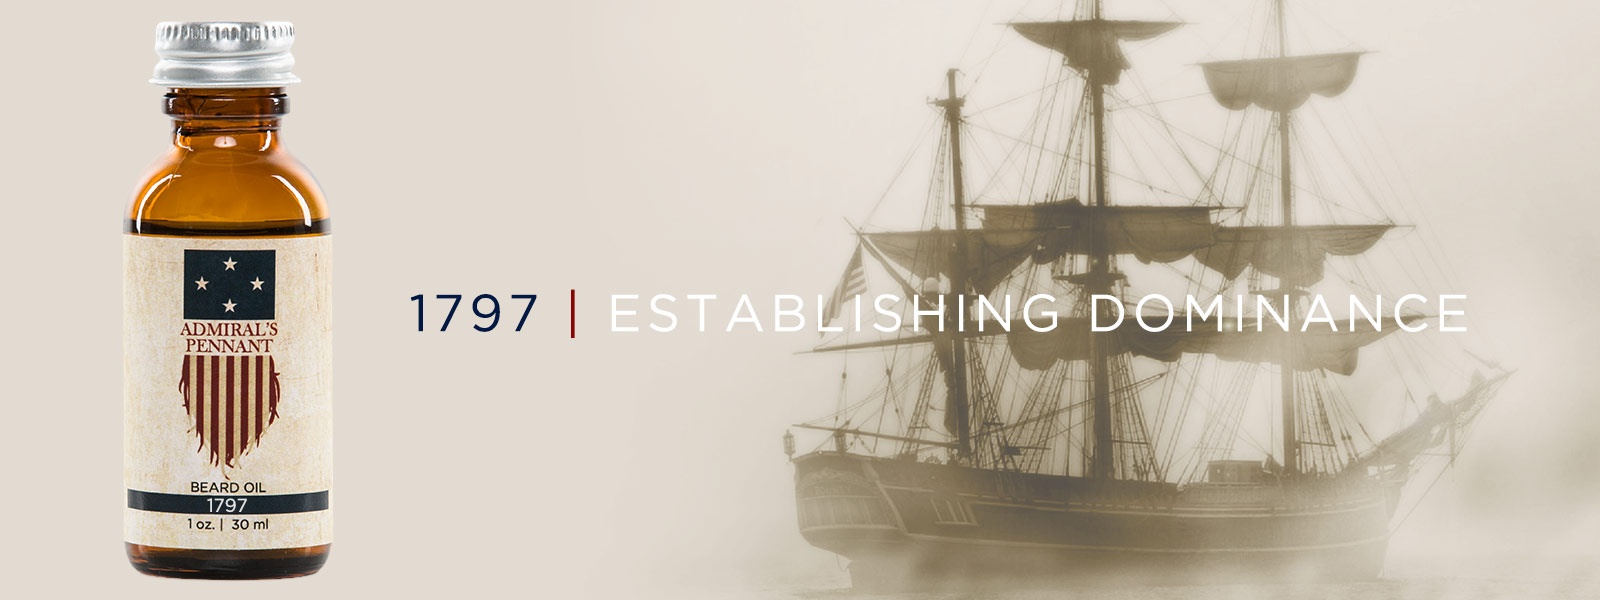 Blend 1797 | Admiral's Pennant Beard Oil